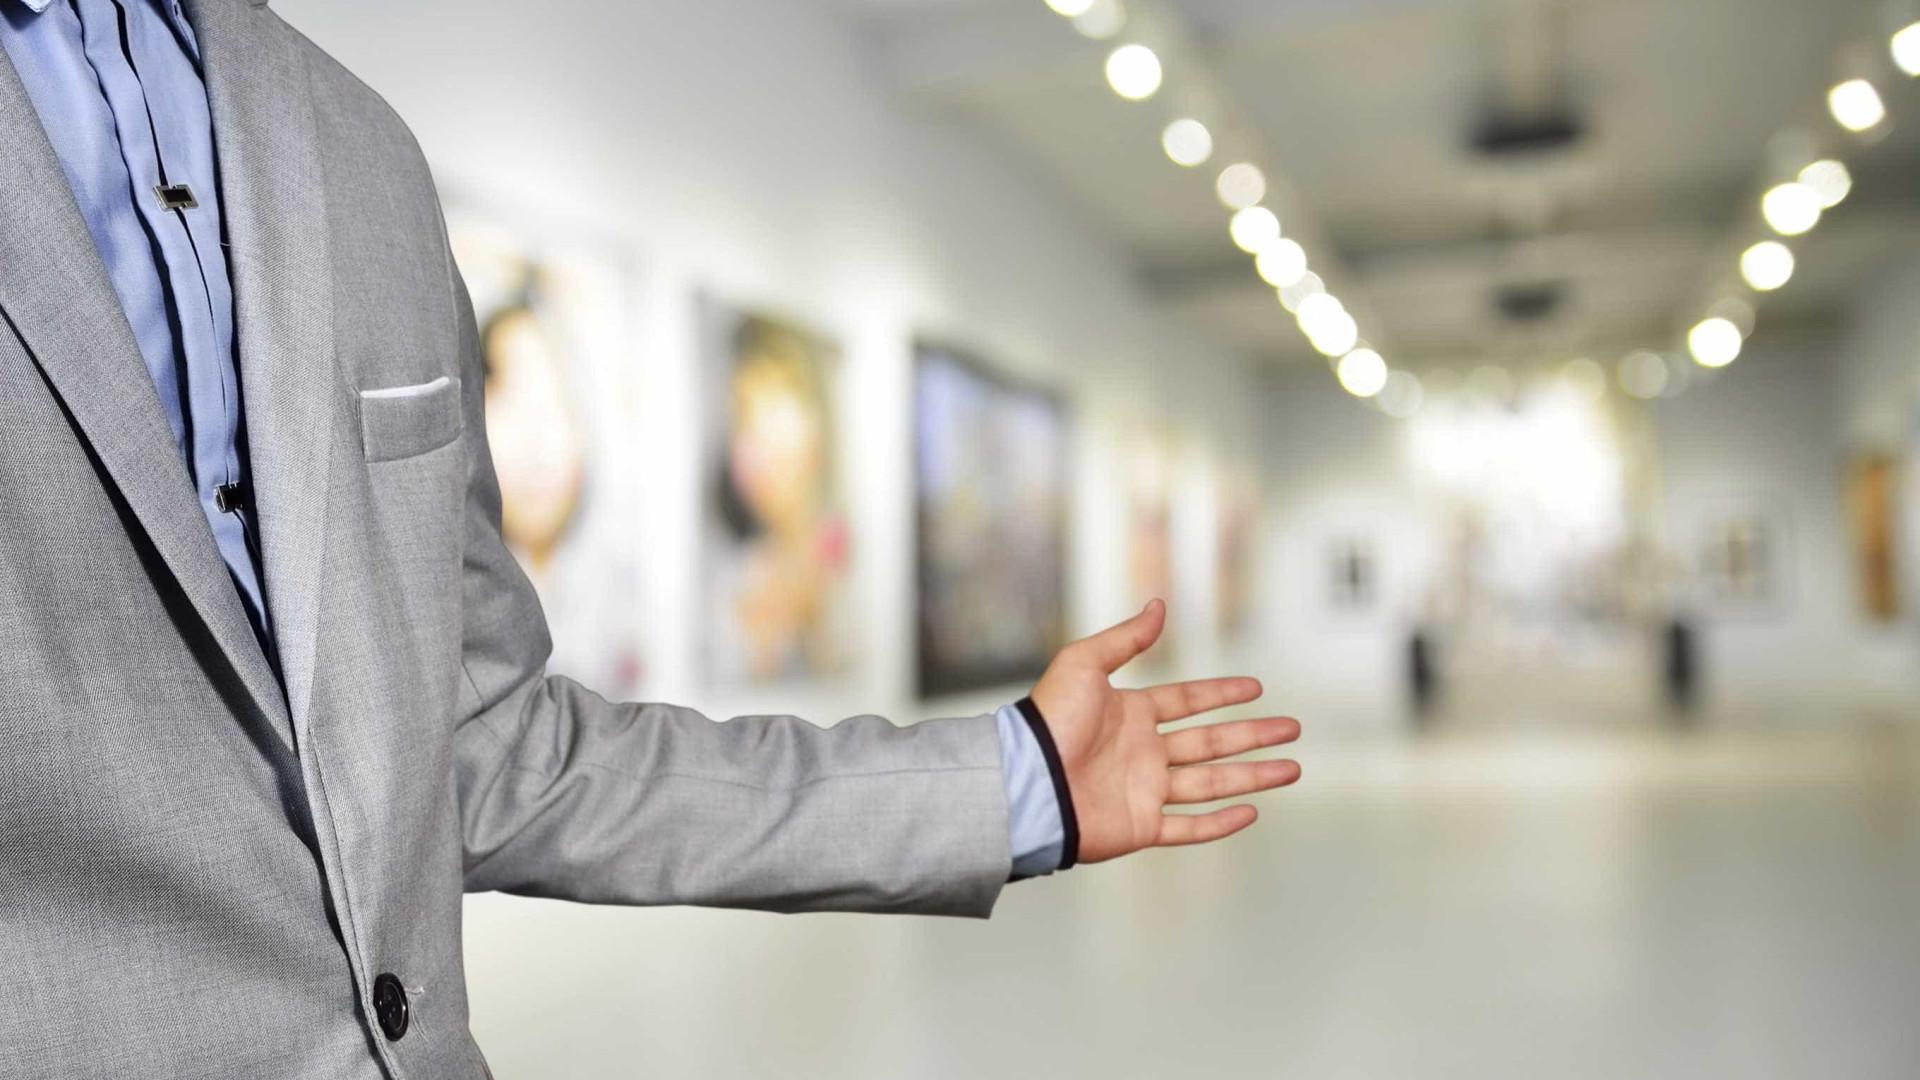 Ilustrador espanhol Isidro Ferrer expõe em Lisboa